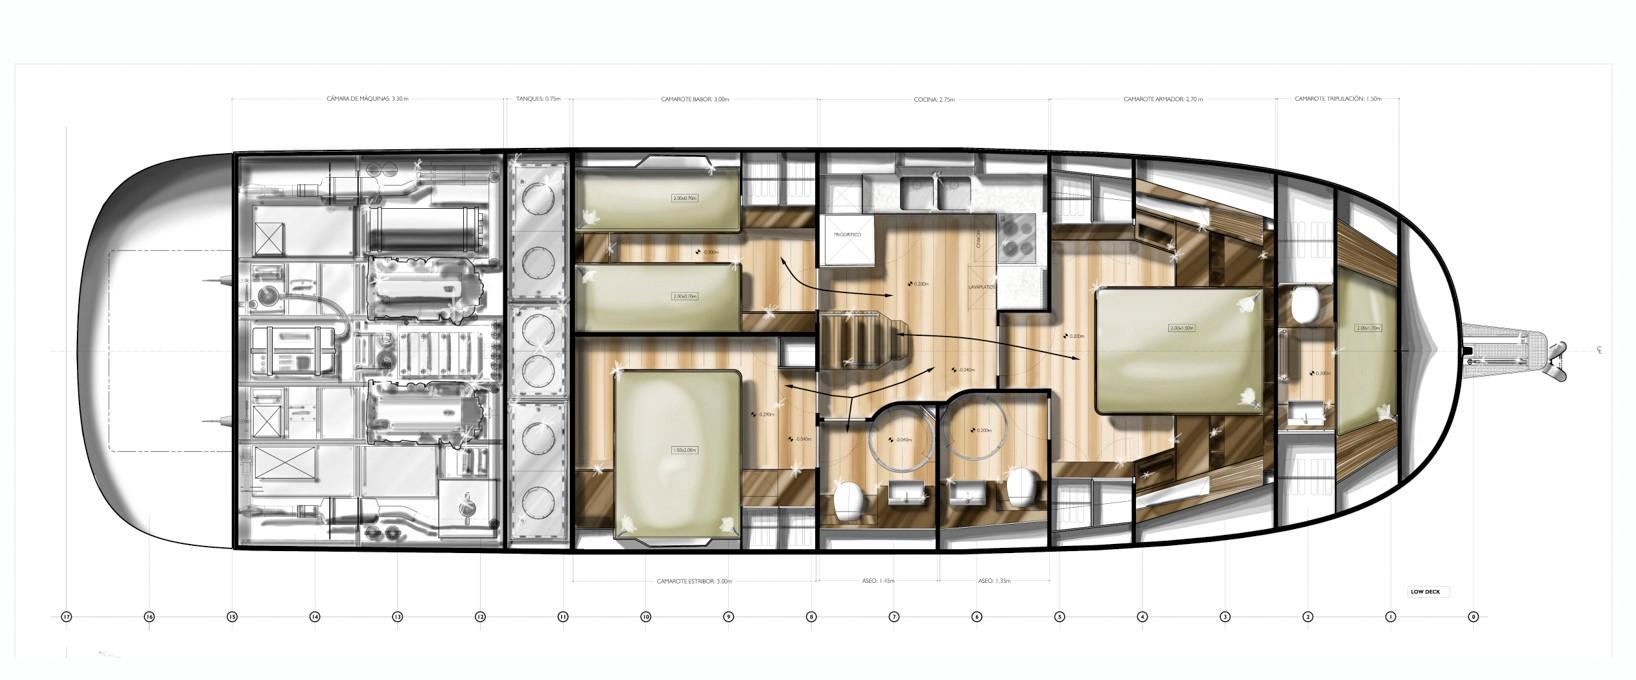 minorca islander 54 hardtop lower deck layout